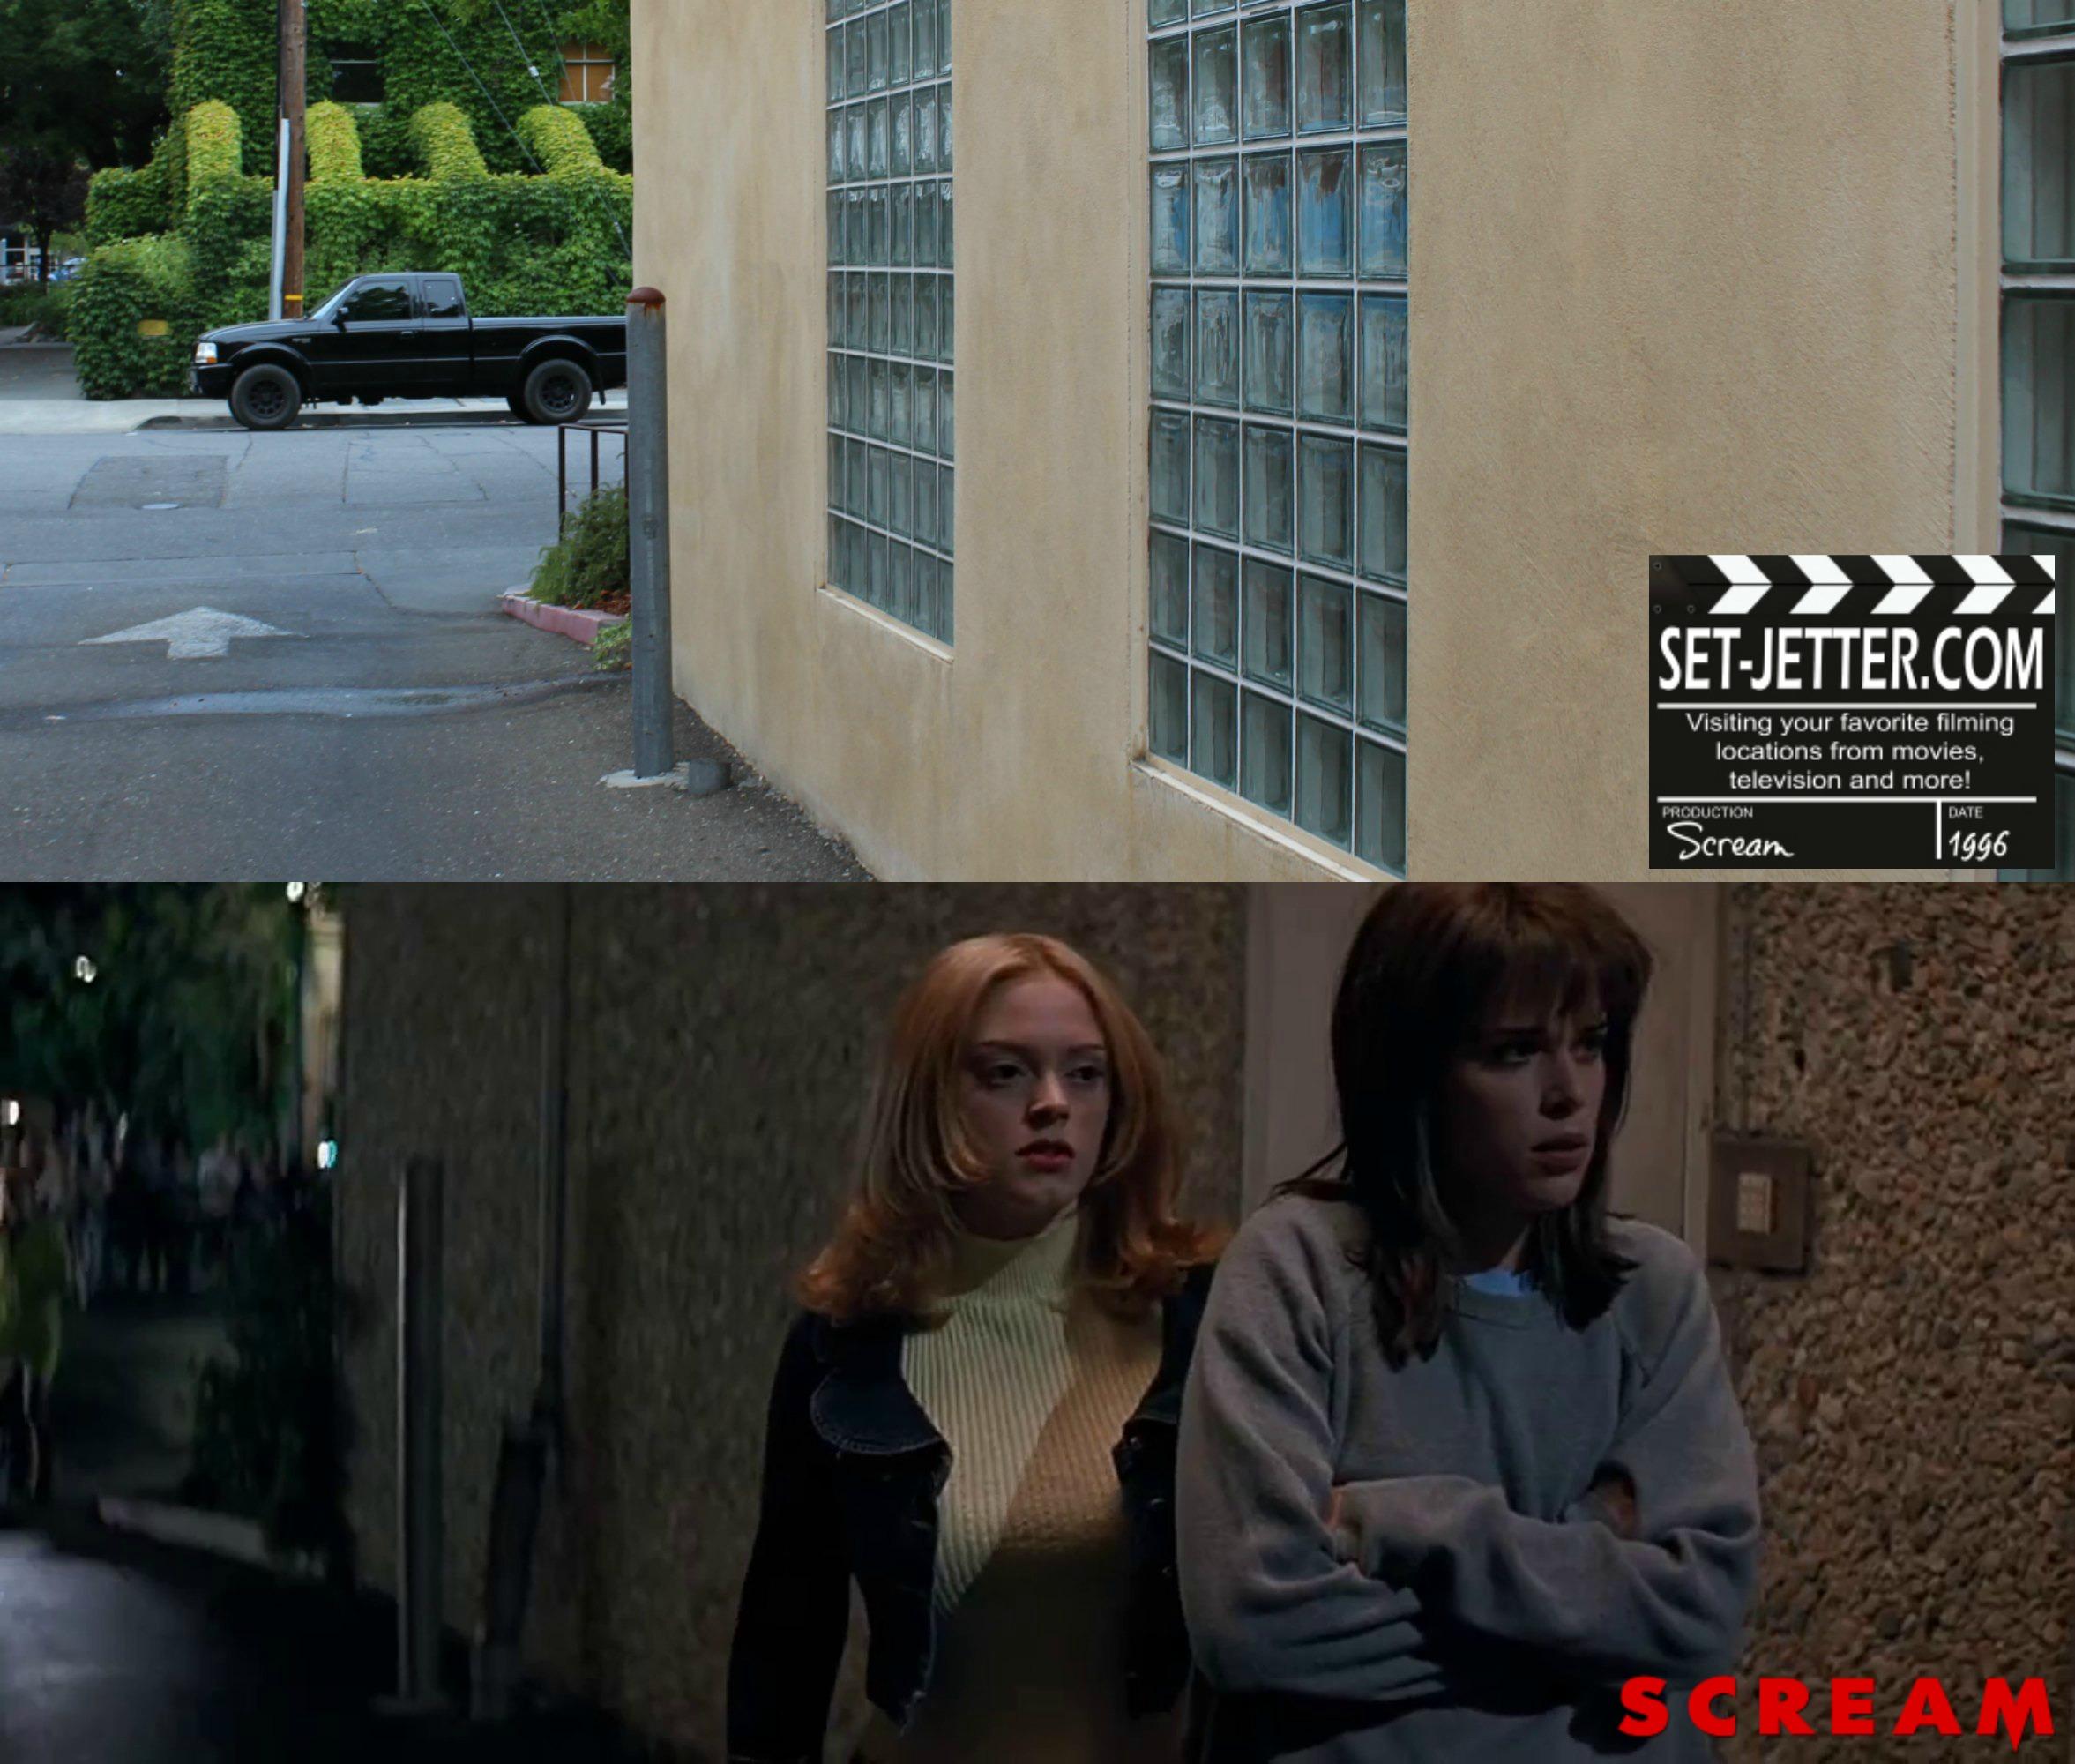 Scream comparison 60.jpg